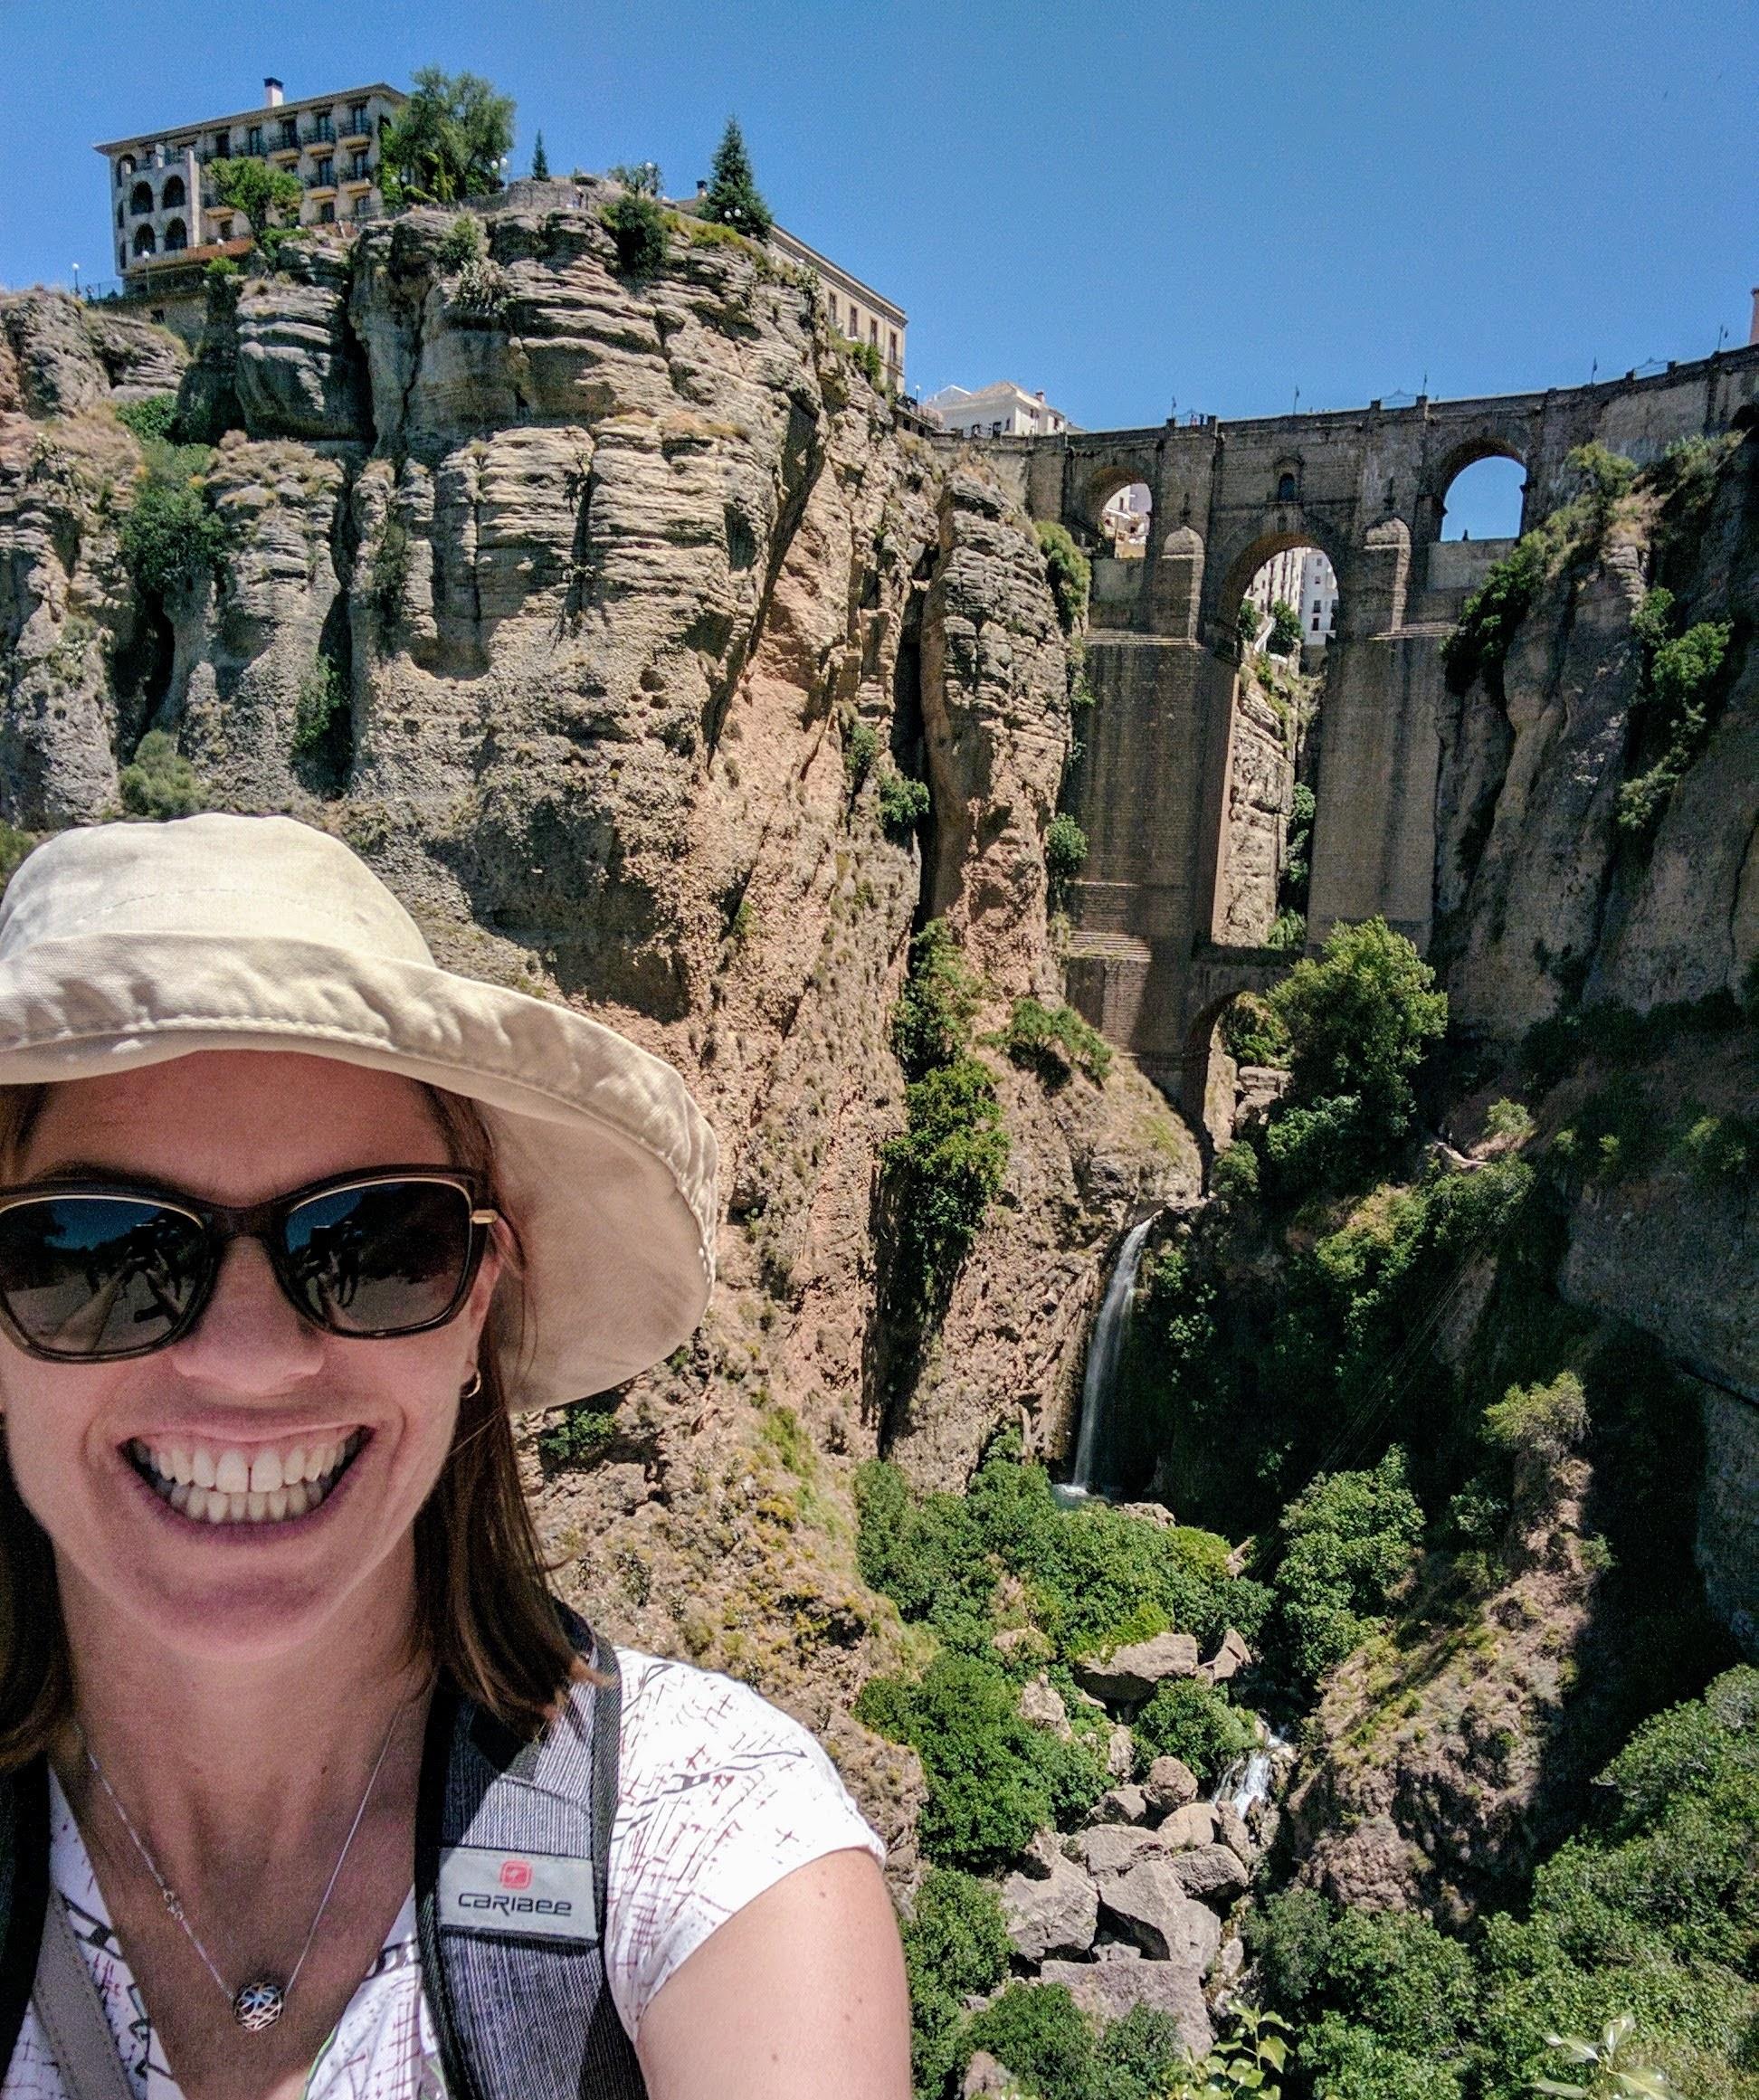 The new bridge of Ronda